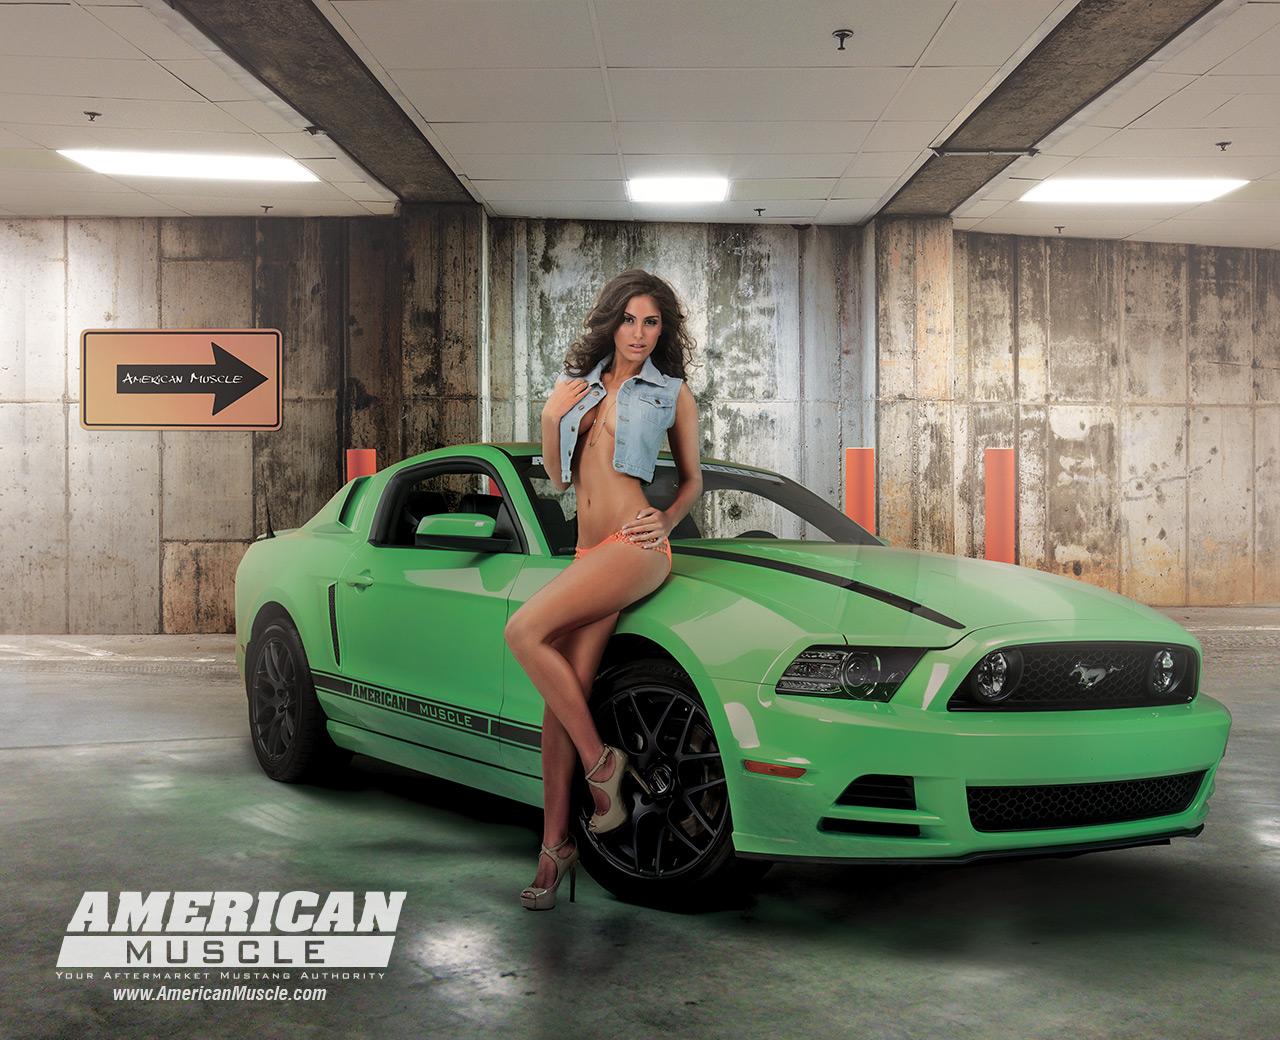 Best Looking Cars Wallpapers Meet The 2013 Am Calendar Girls Americanmuscle Com